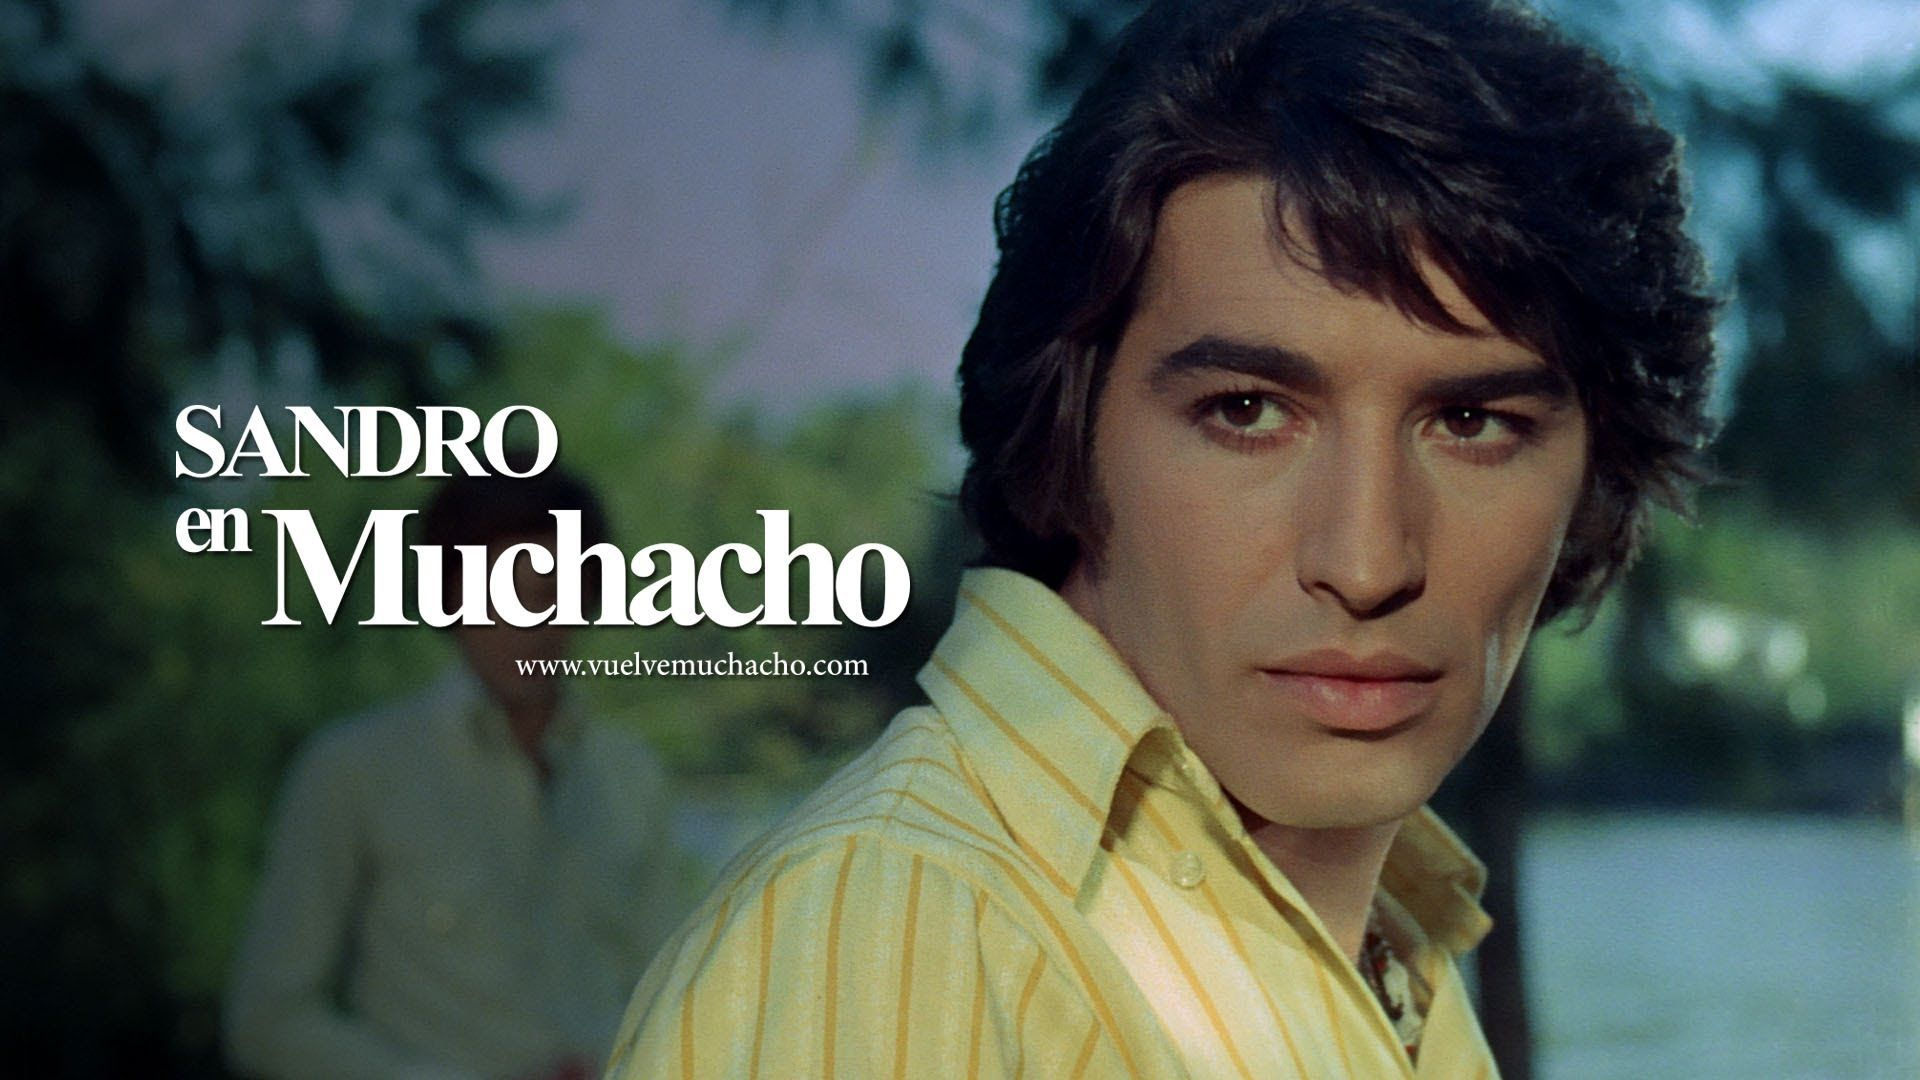 Vuelve Muchacho Con Sandro Trailer Remasterizado Hd Sandro De America Sandro Musica Para Mama